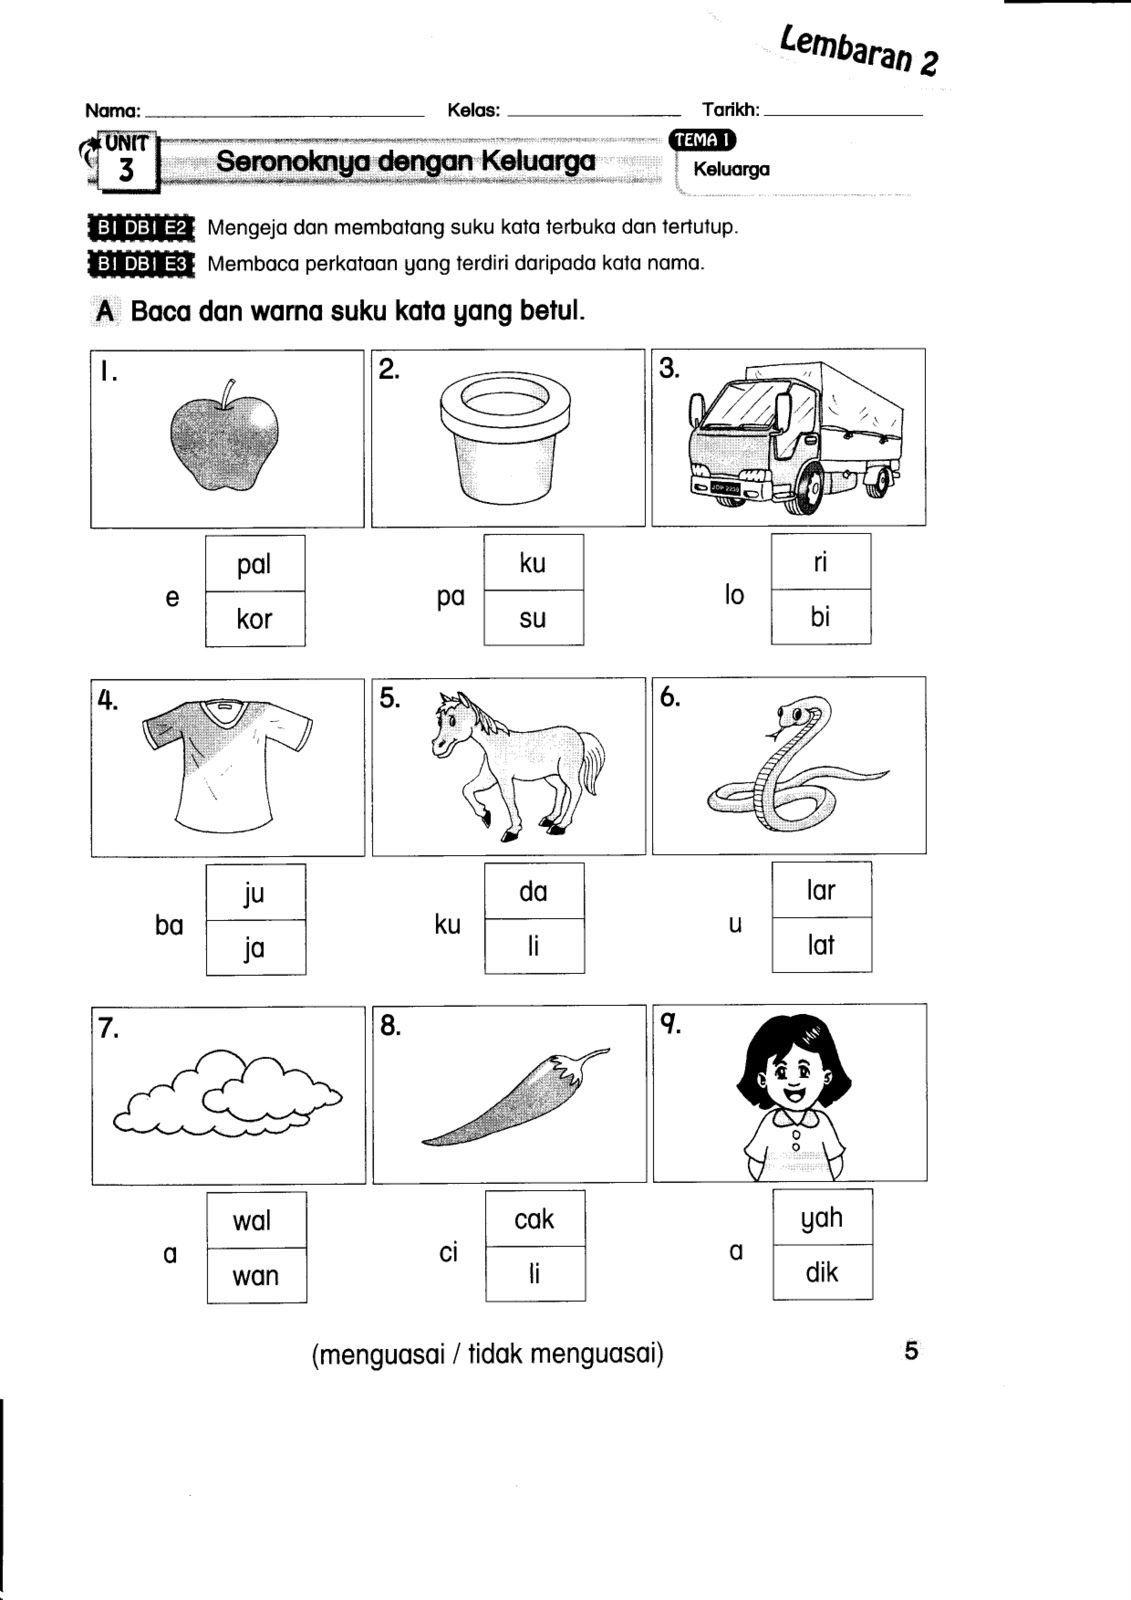 Image Result For Latihan Bahasa Melayu Tadika 6 Tahun